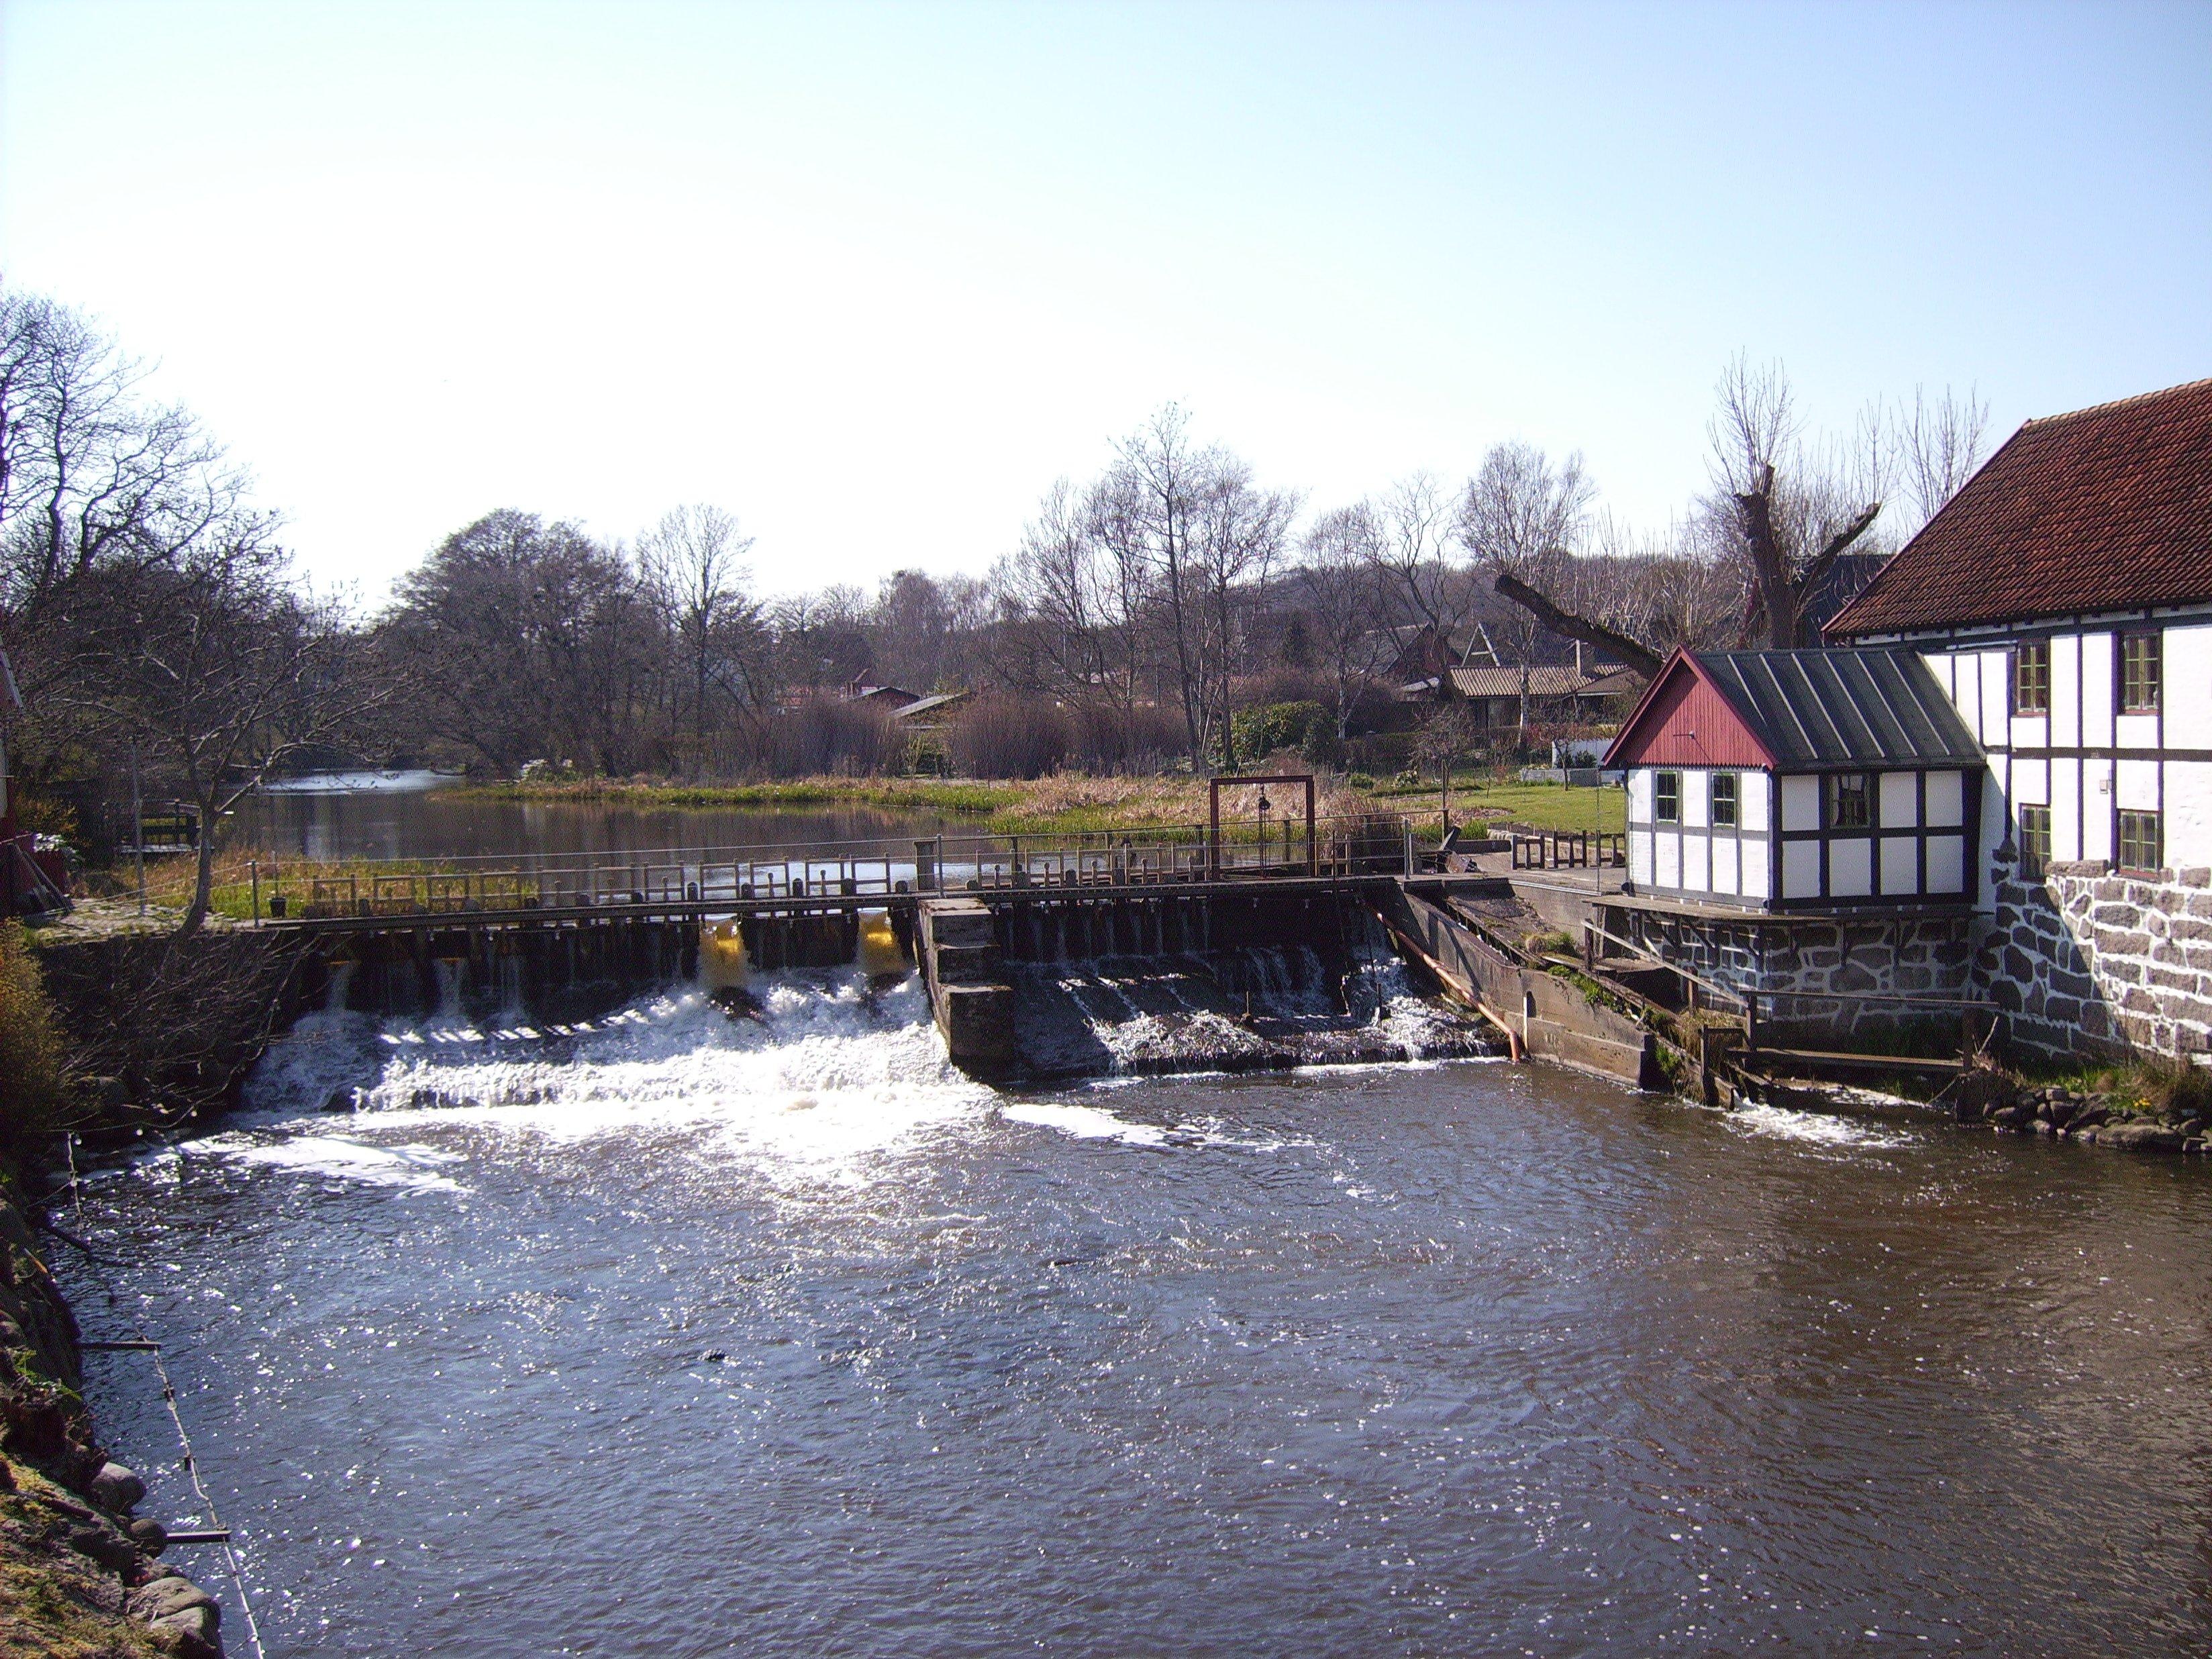 Sæby vandmølle - Danhostel Frederikshavn